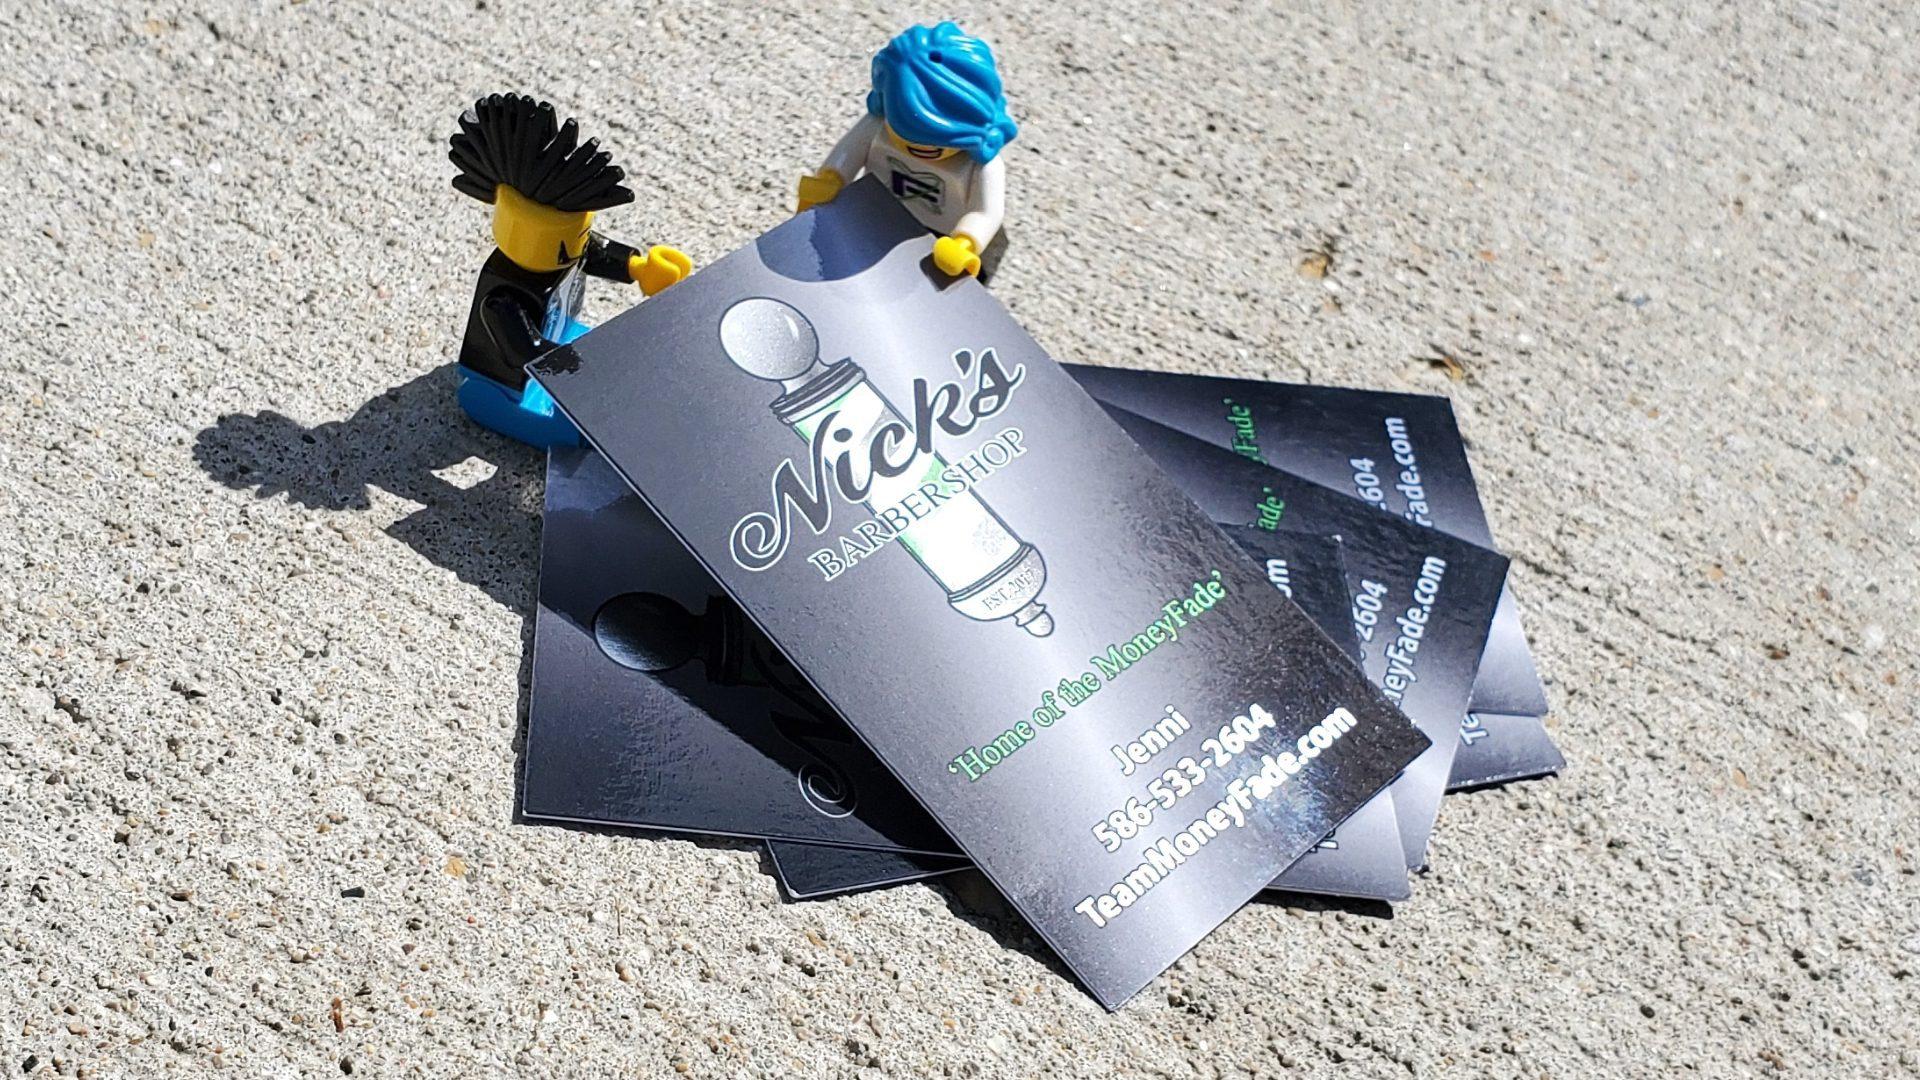 Nicks Barbershop - Jenni Card Lego Mockup 02